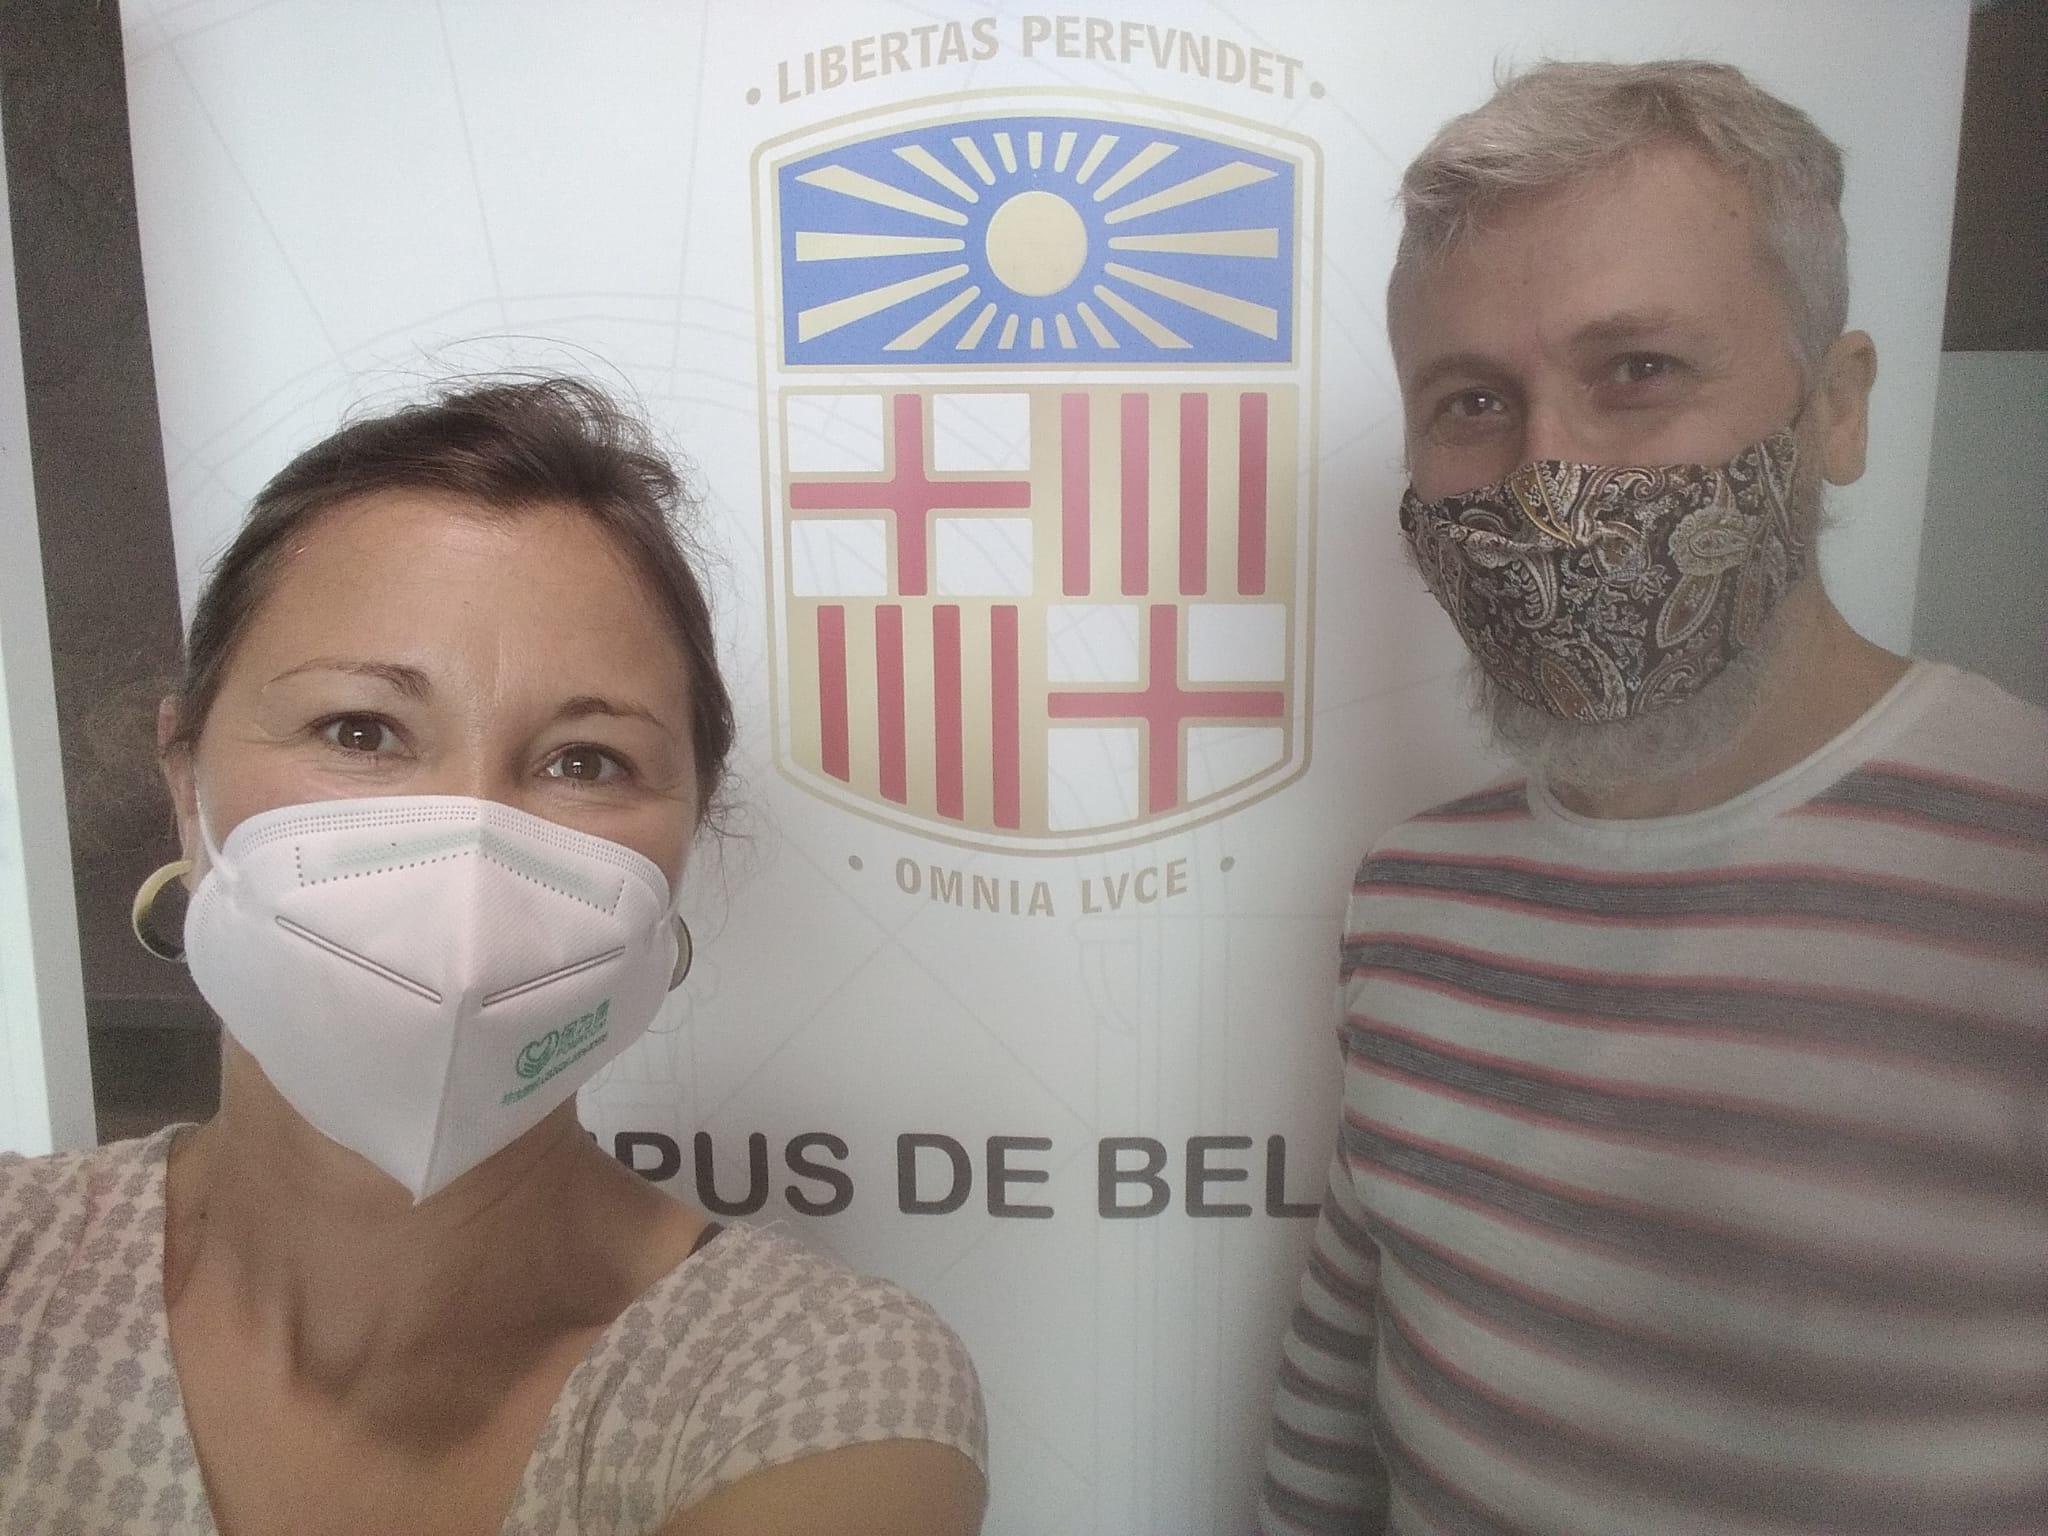 Realitat virtual al campus Bellvitge Nou hospital evangelic Abel Gelabert i Miriam Herrera grau fisioterapia